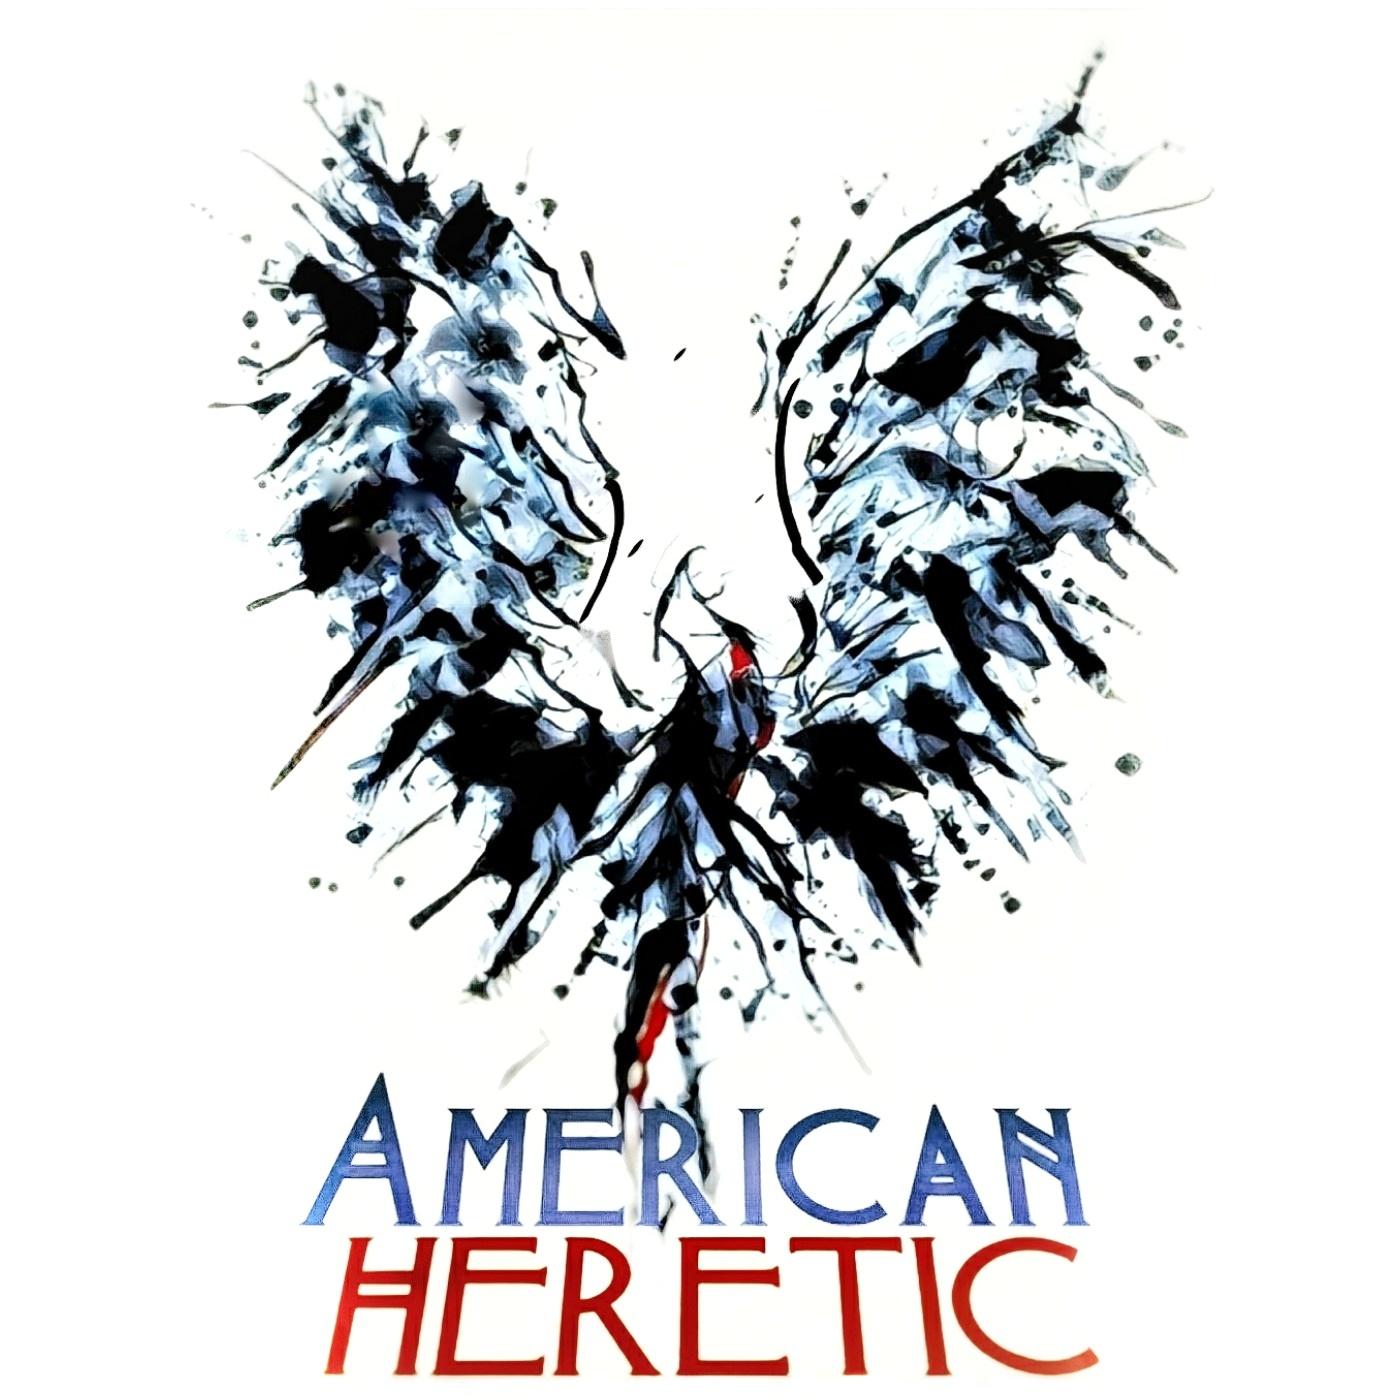 American Heretic